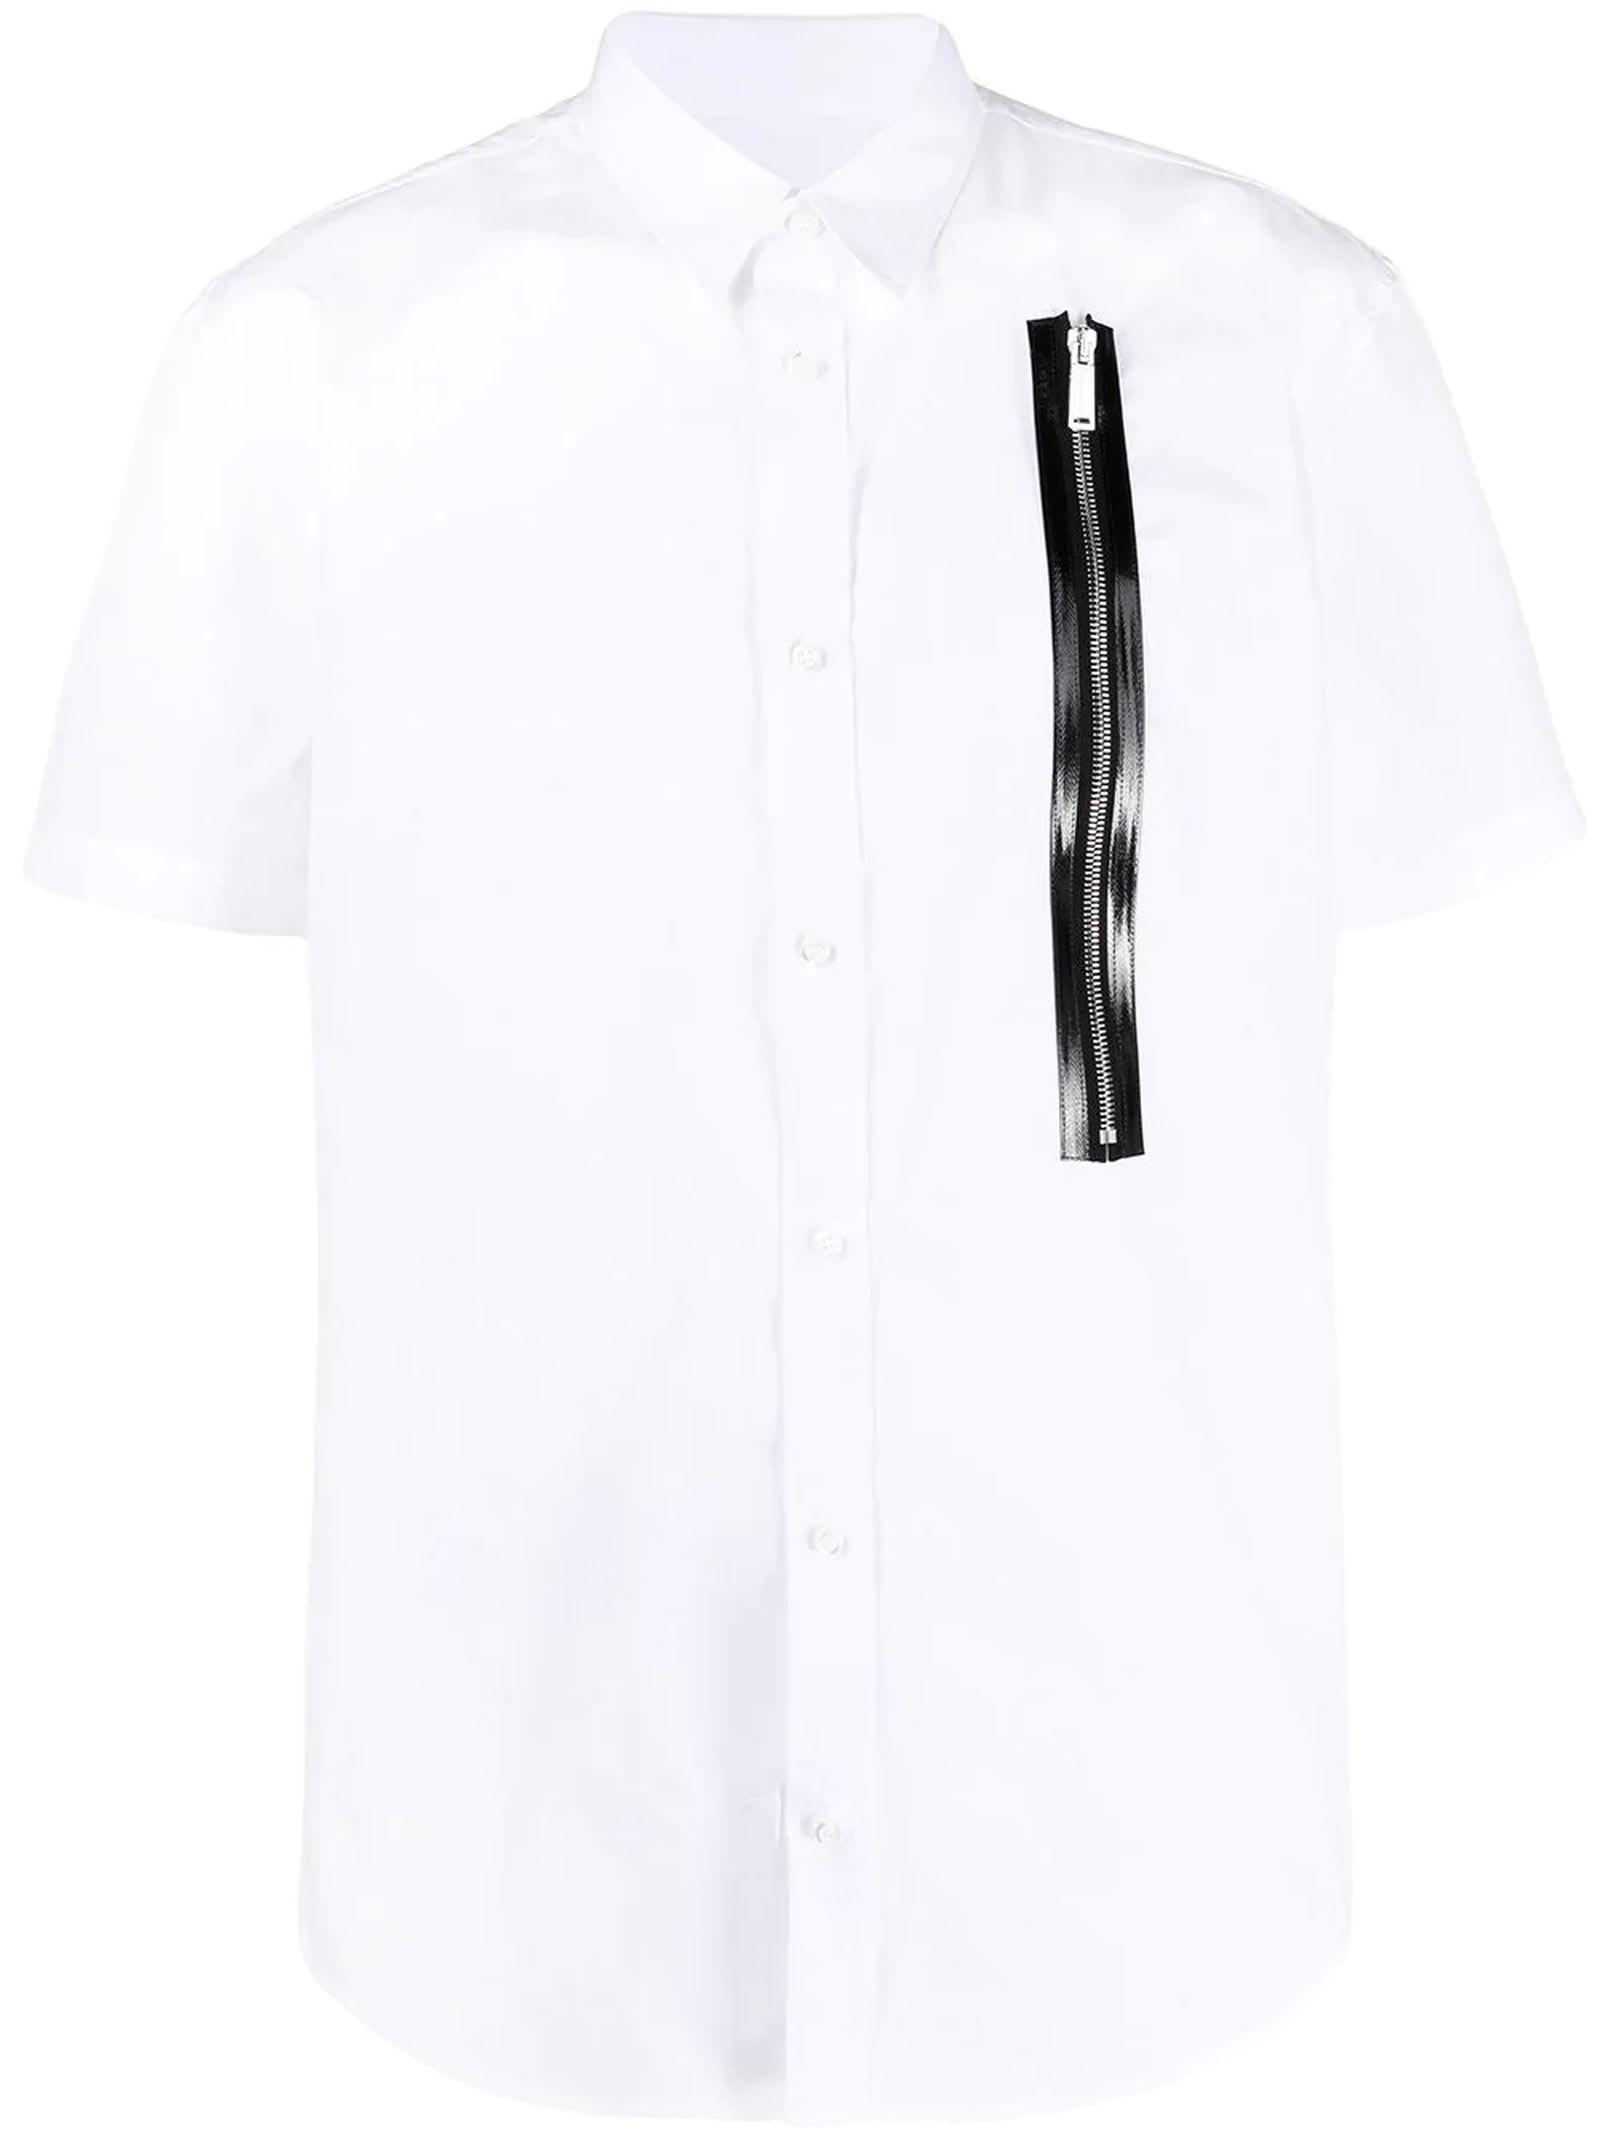 Dsquared2 White Cotton Shirt